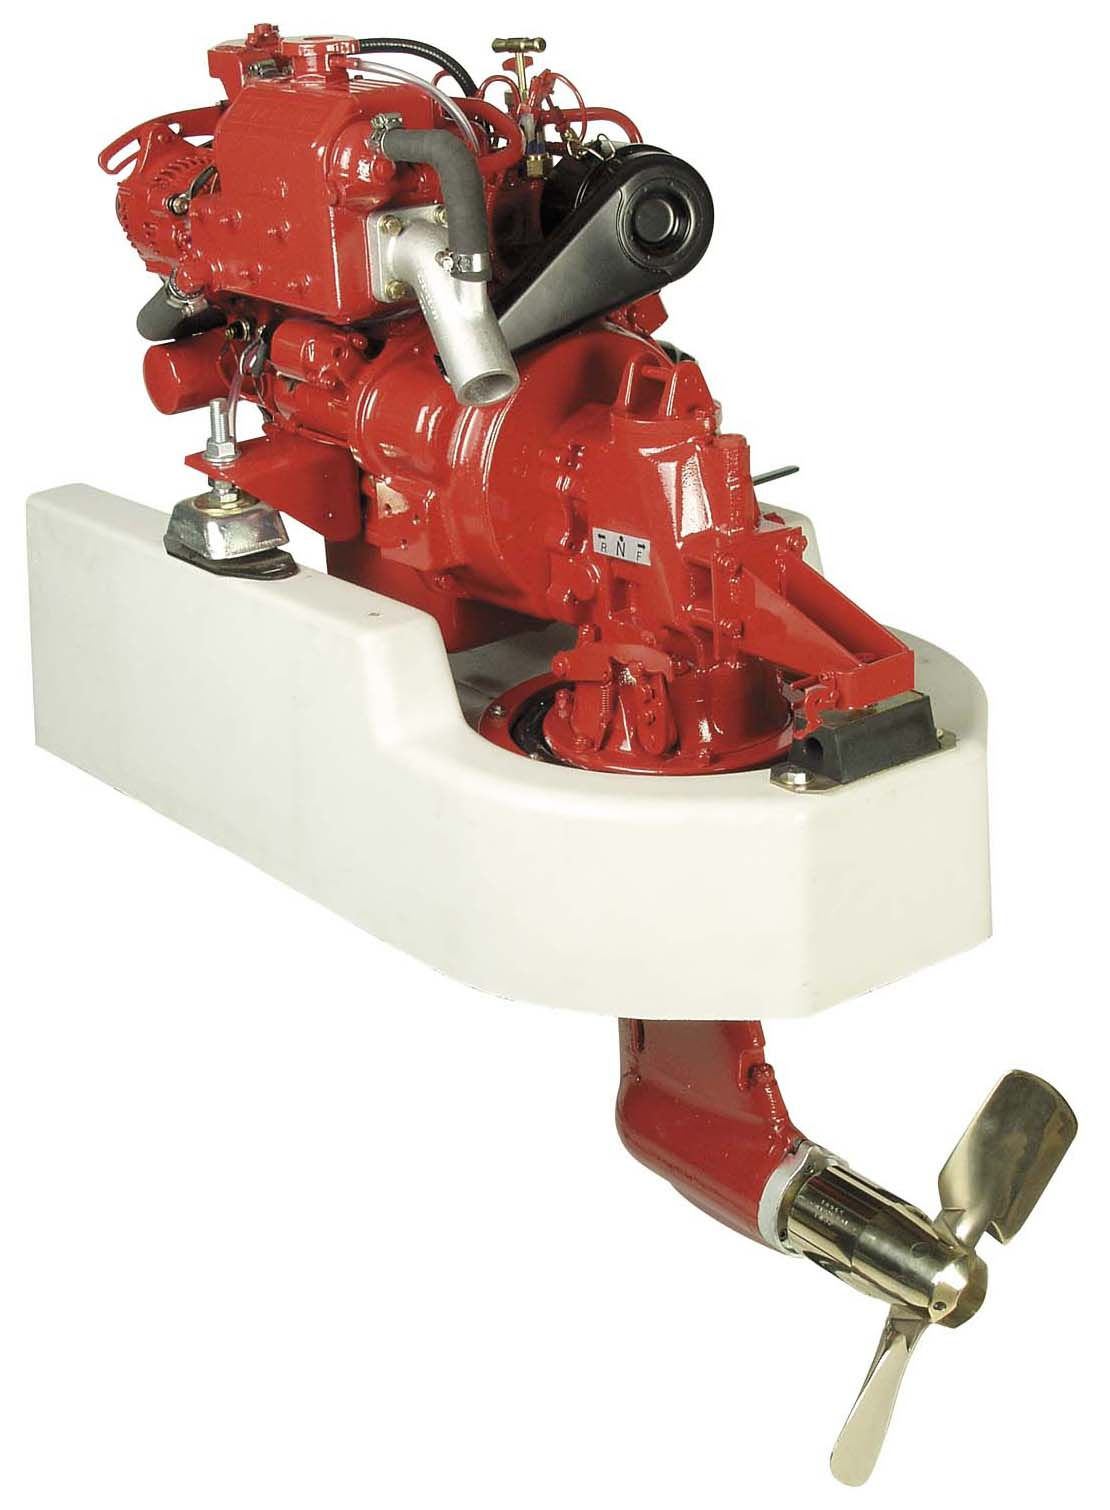 Choosing The Right Marine Diesel Boatscom Wiring Harness Engines Inboard Sterndrive Outboard Beta Saildrive